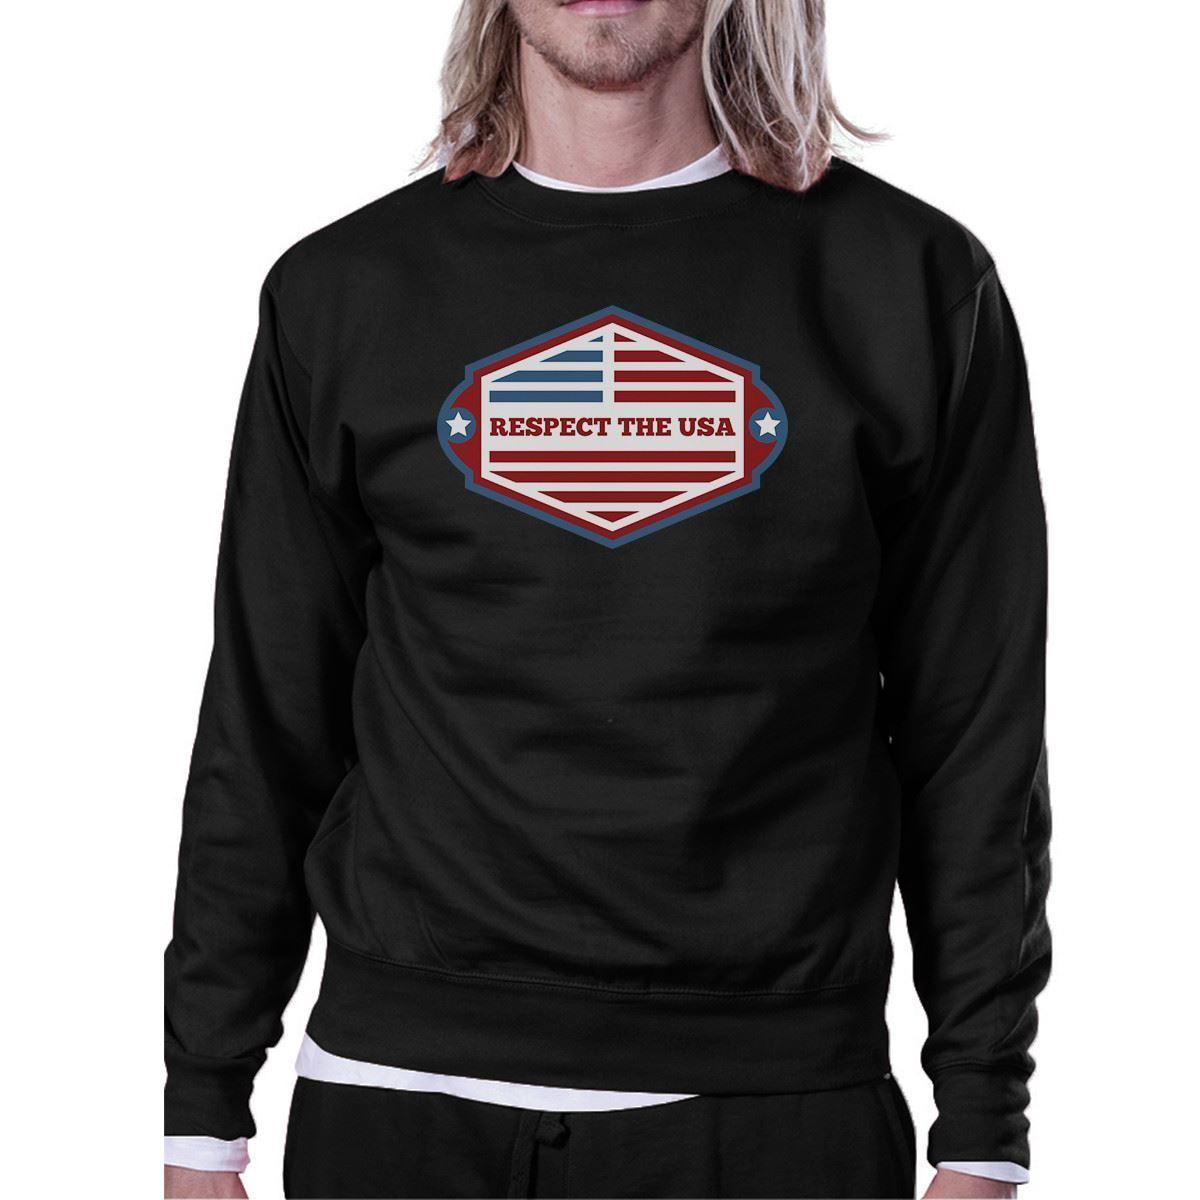 Respect The USA Unisex Black Sweatshirt Crewneck Pullover Fleece - $20.99 - $21.99